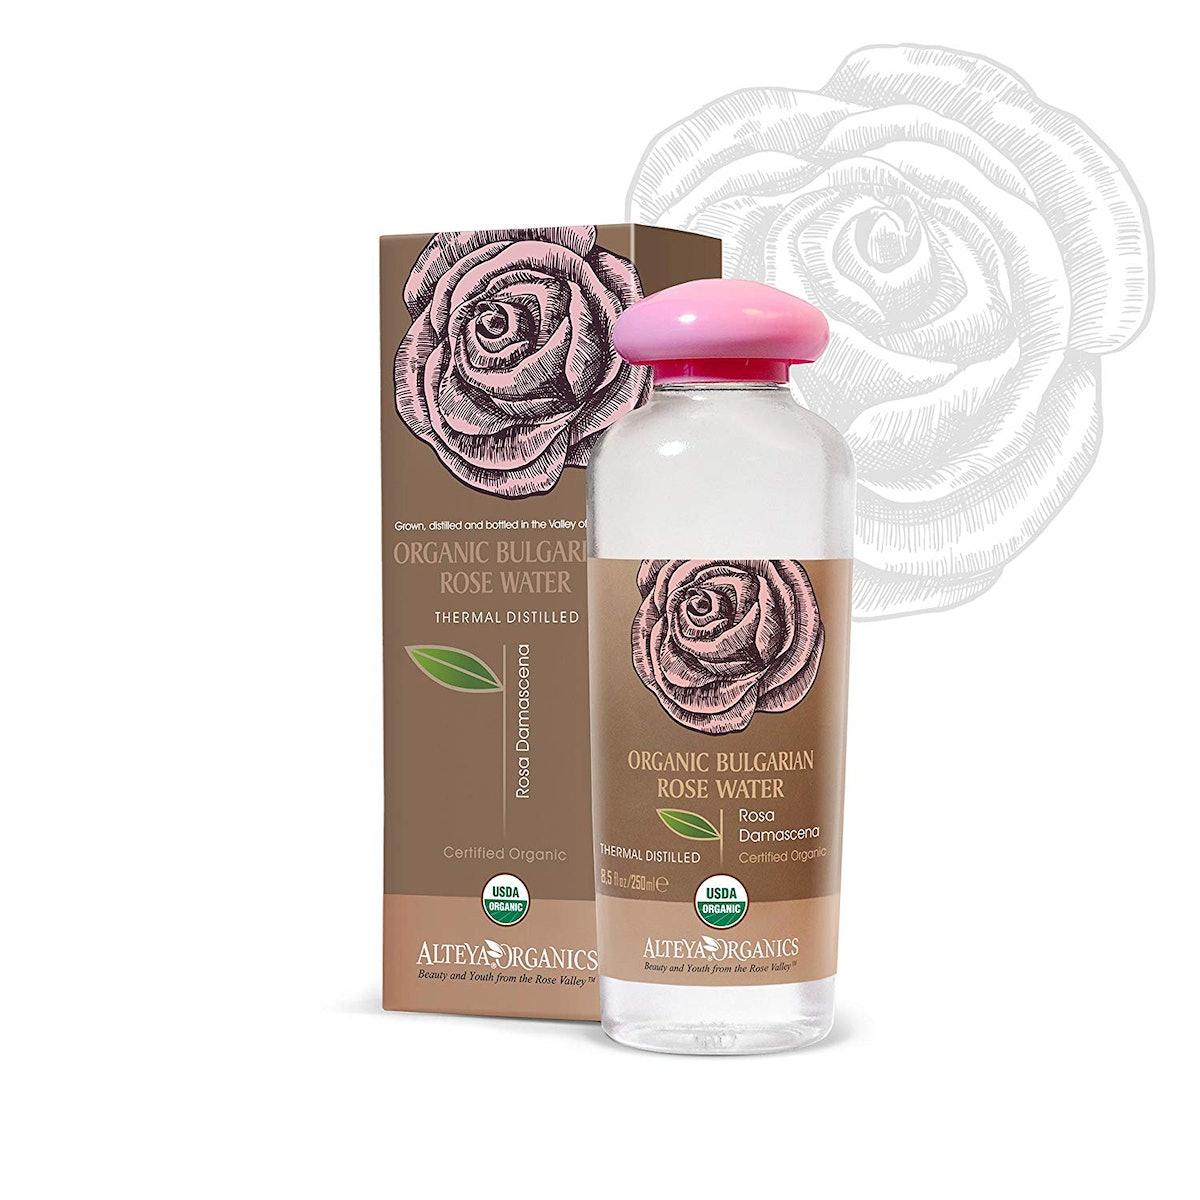 Alteya USDA Organic Bulgarian Rose Water